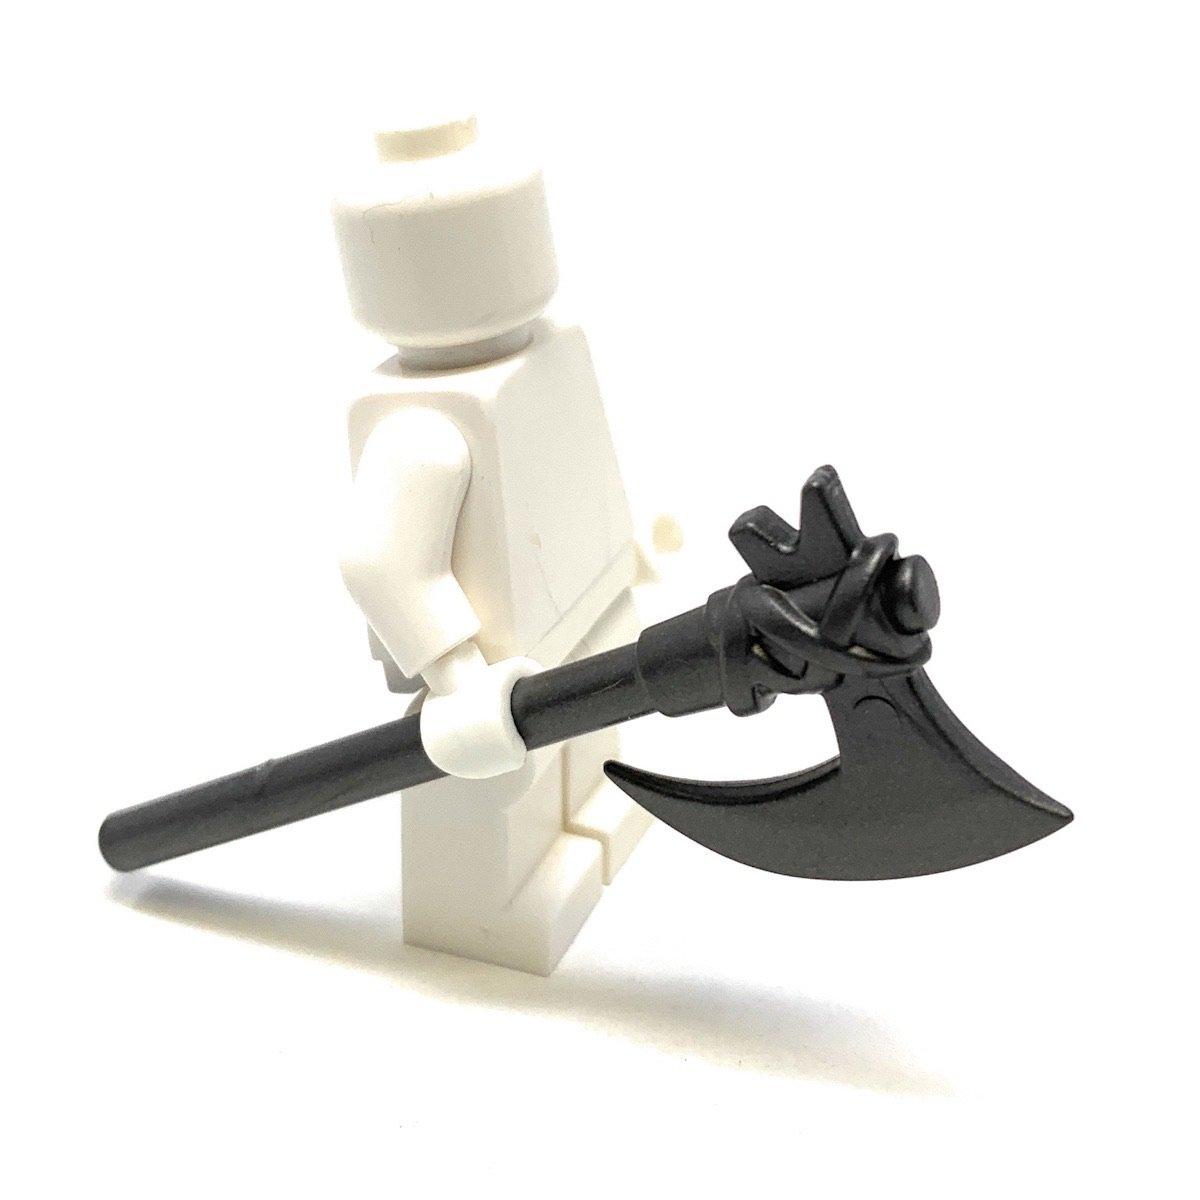 Lego Executioner